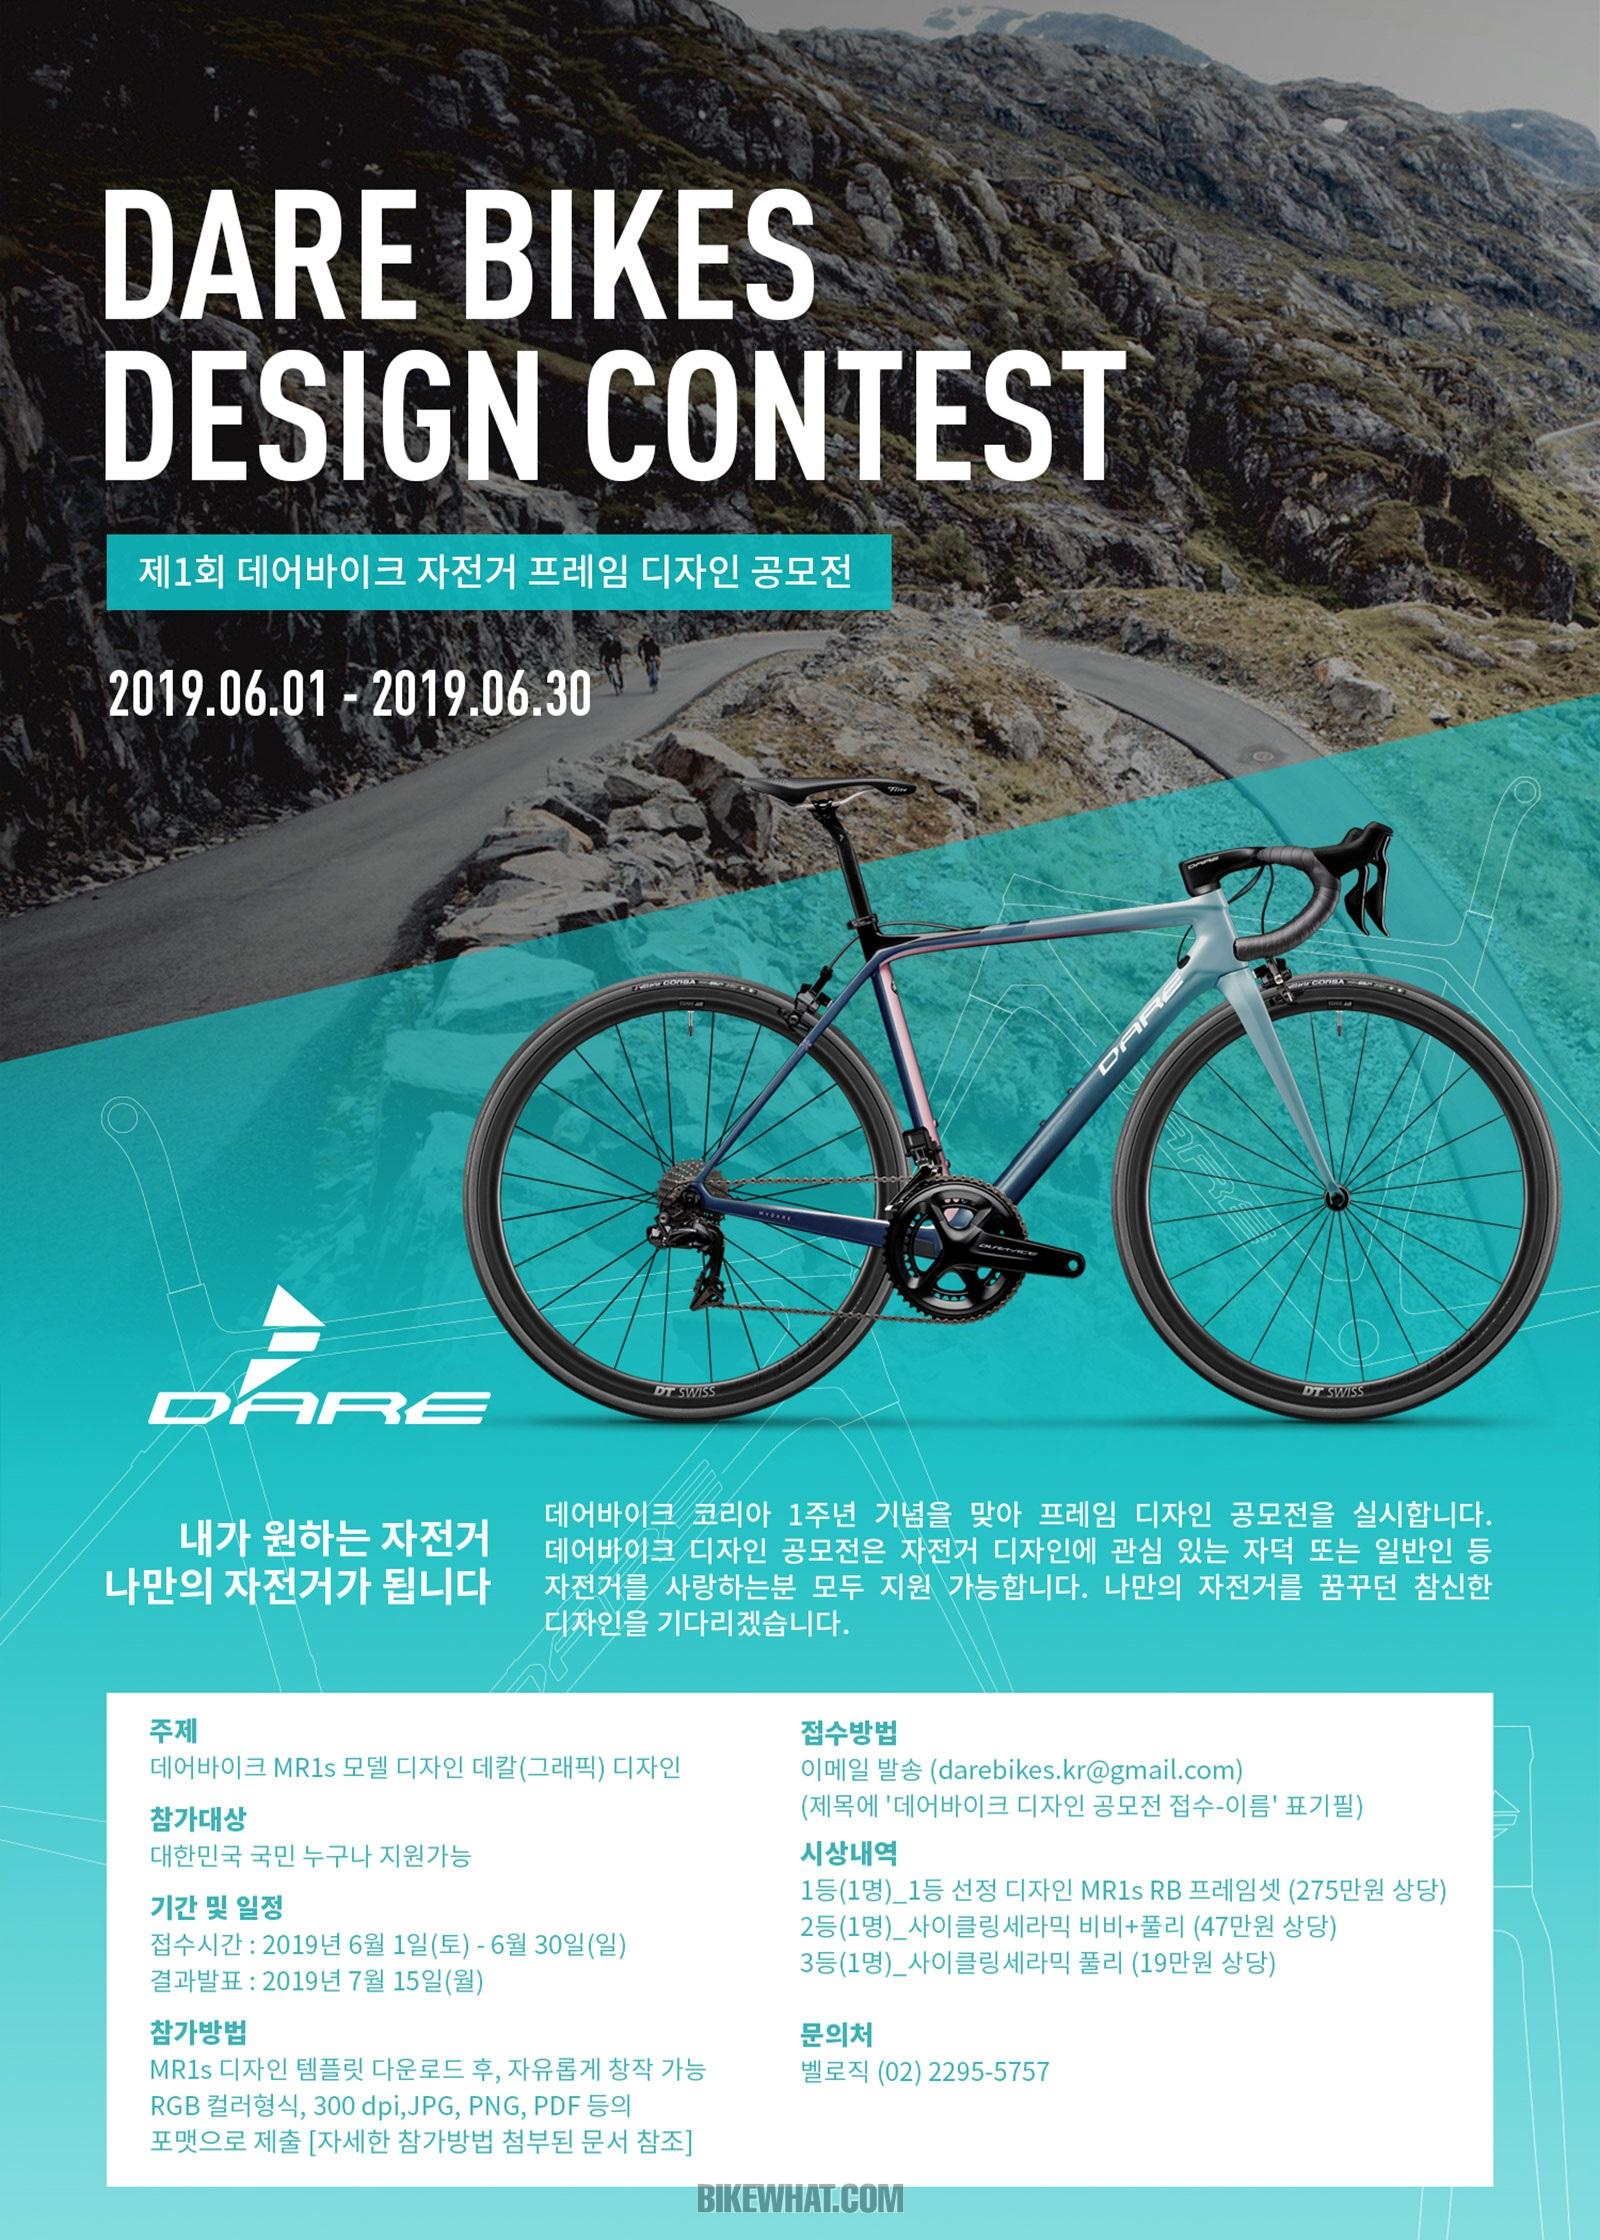 News_Velogic_Dare_Design_Contest_1.jpg